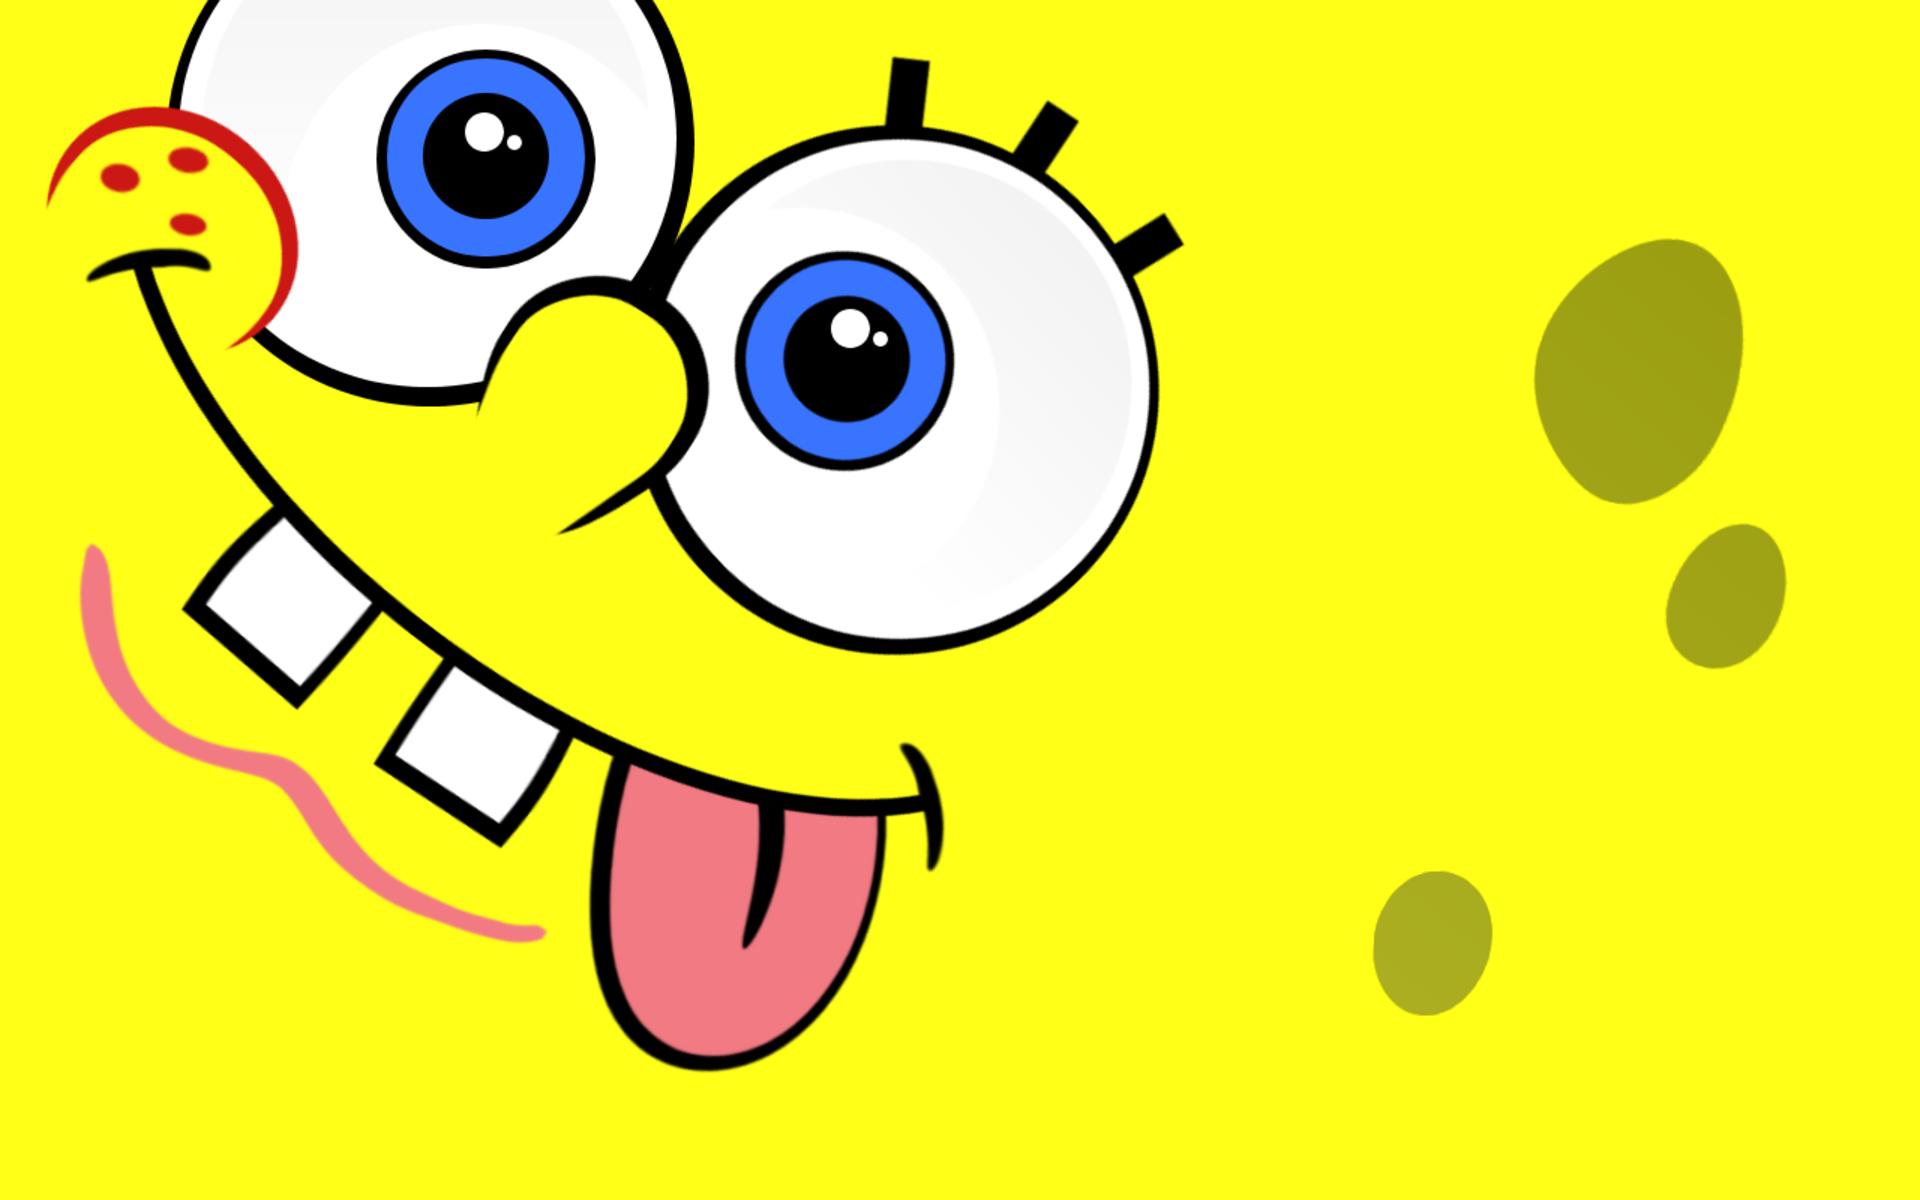 ... Wallpaper Spongebob Squarepants Funny Face Spongebob Squarepants Funny ...